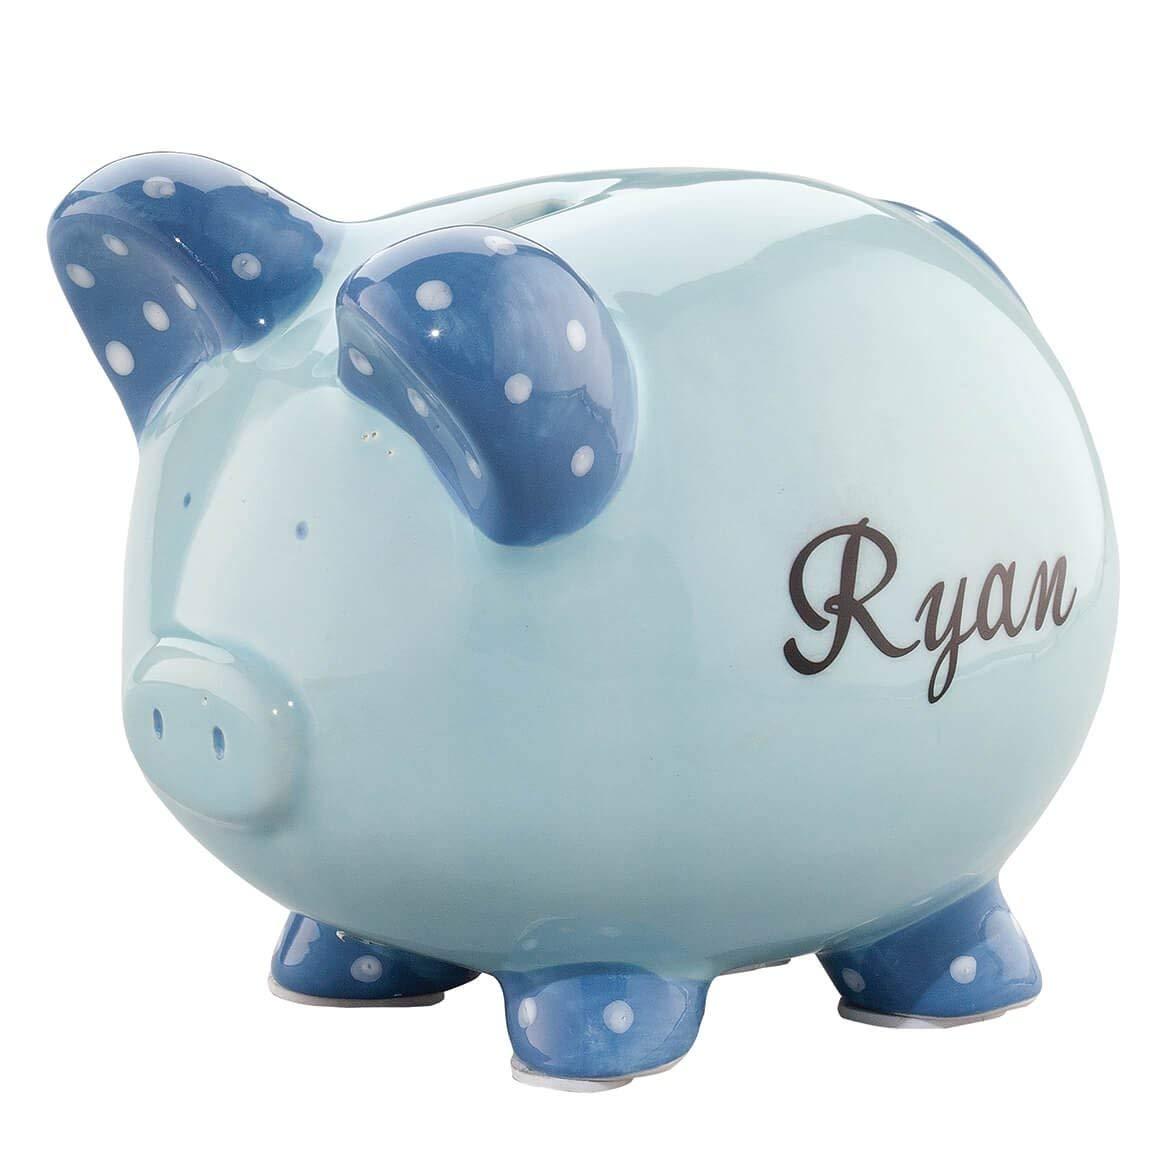 Junior groomsmen gifts Personalized Ceramic Kids Piggy Bank